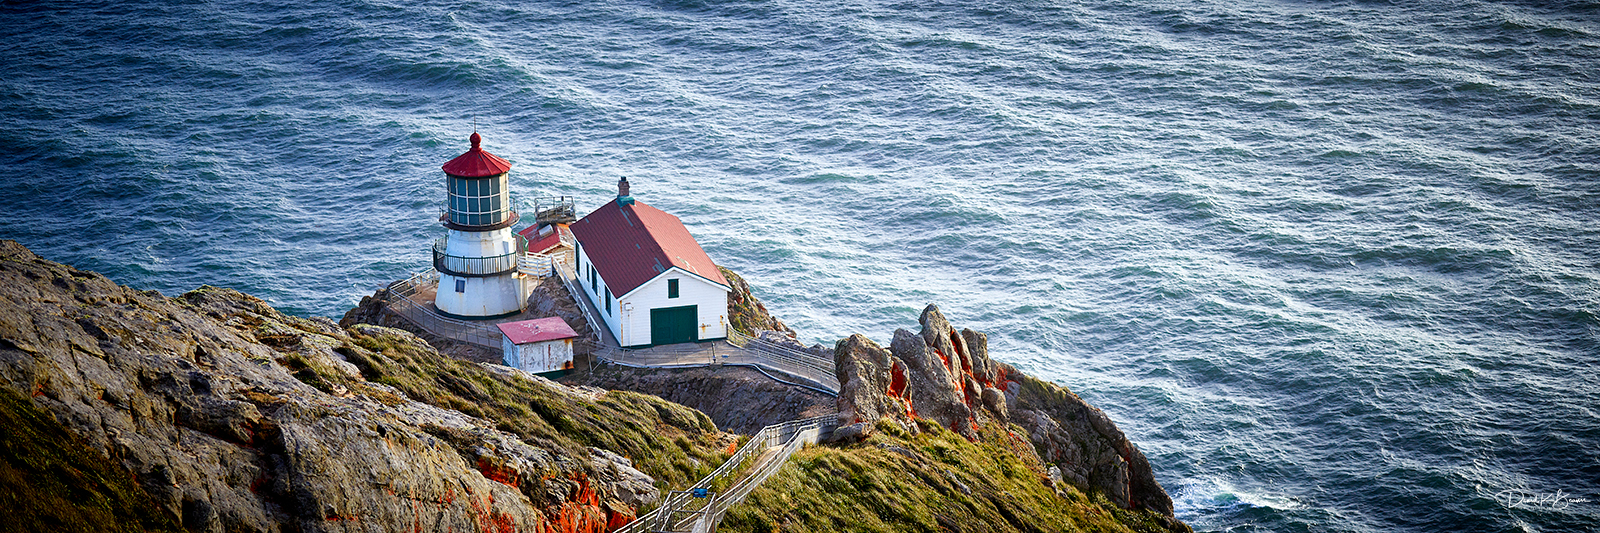 Point reyes light house r8glqe